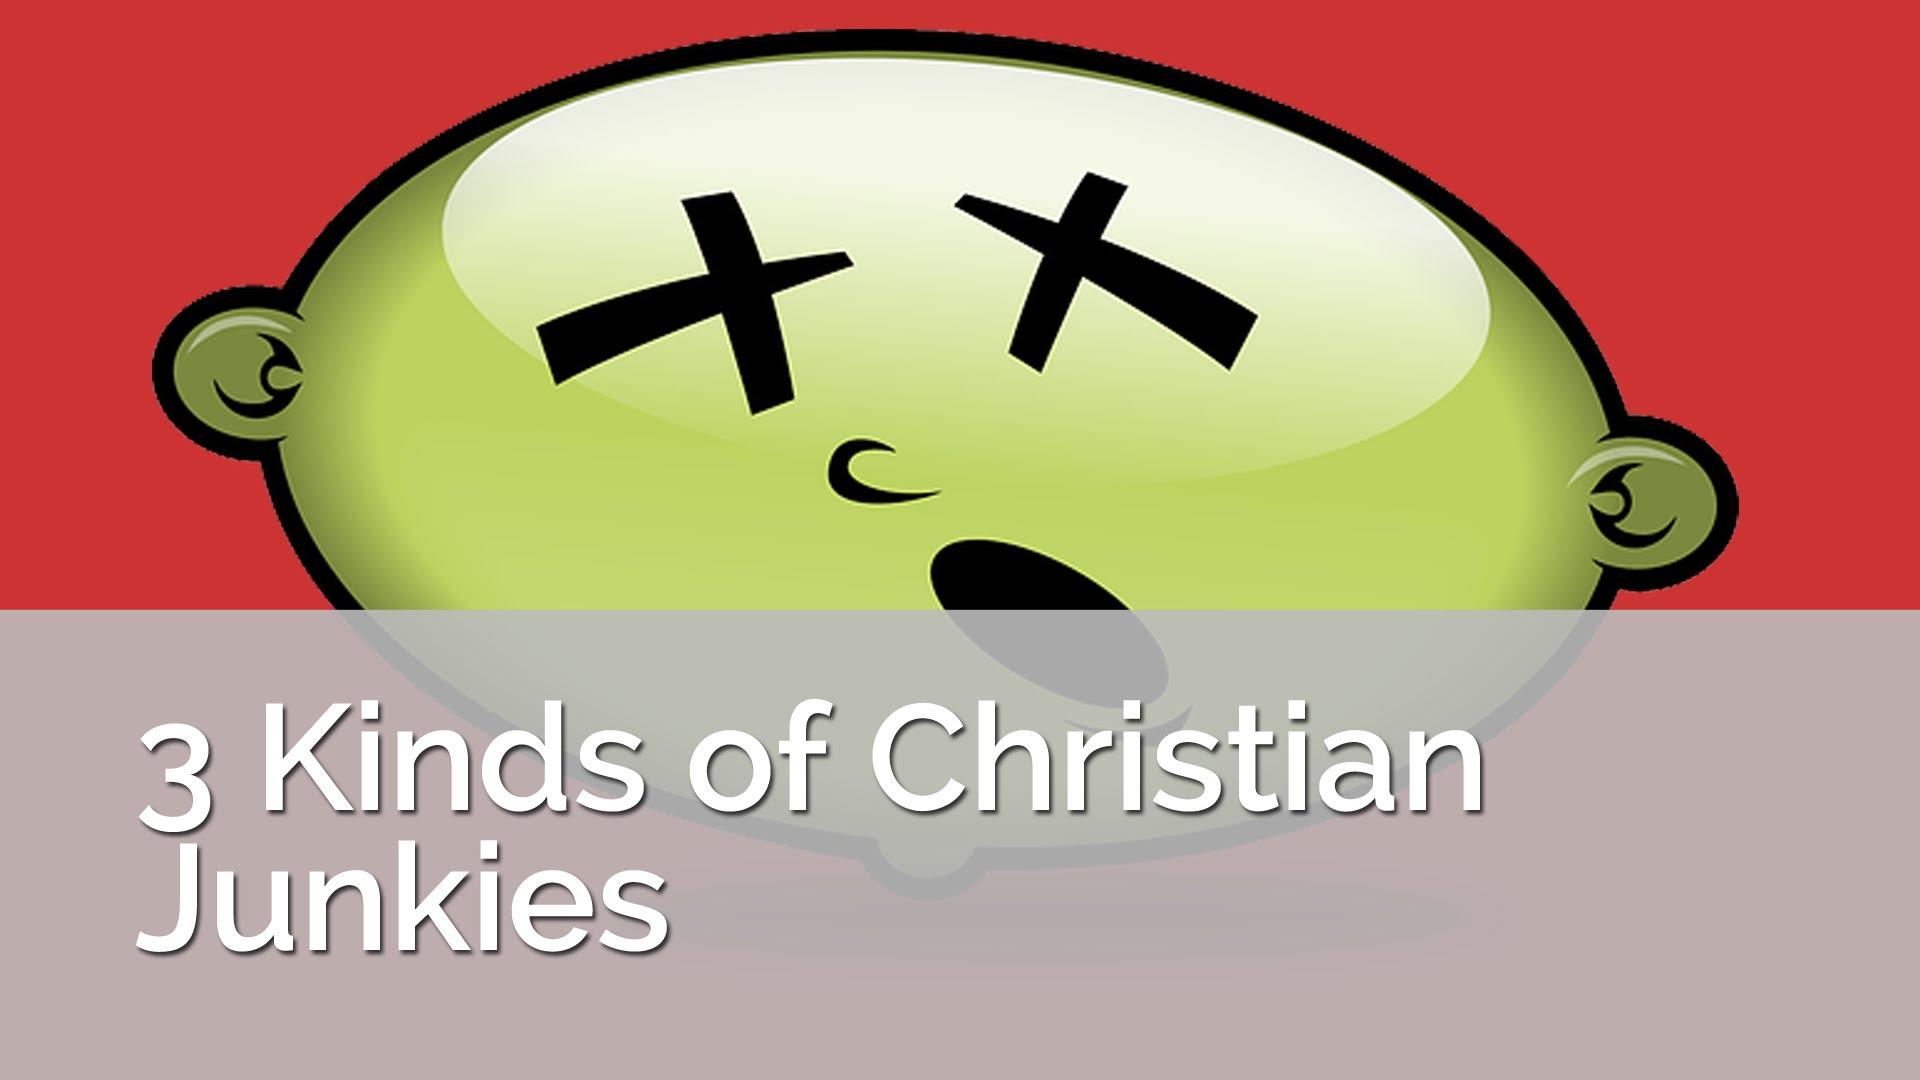 3 Types de Junkies chrétiens